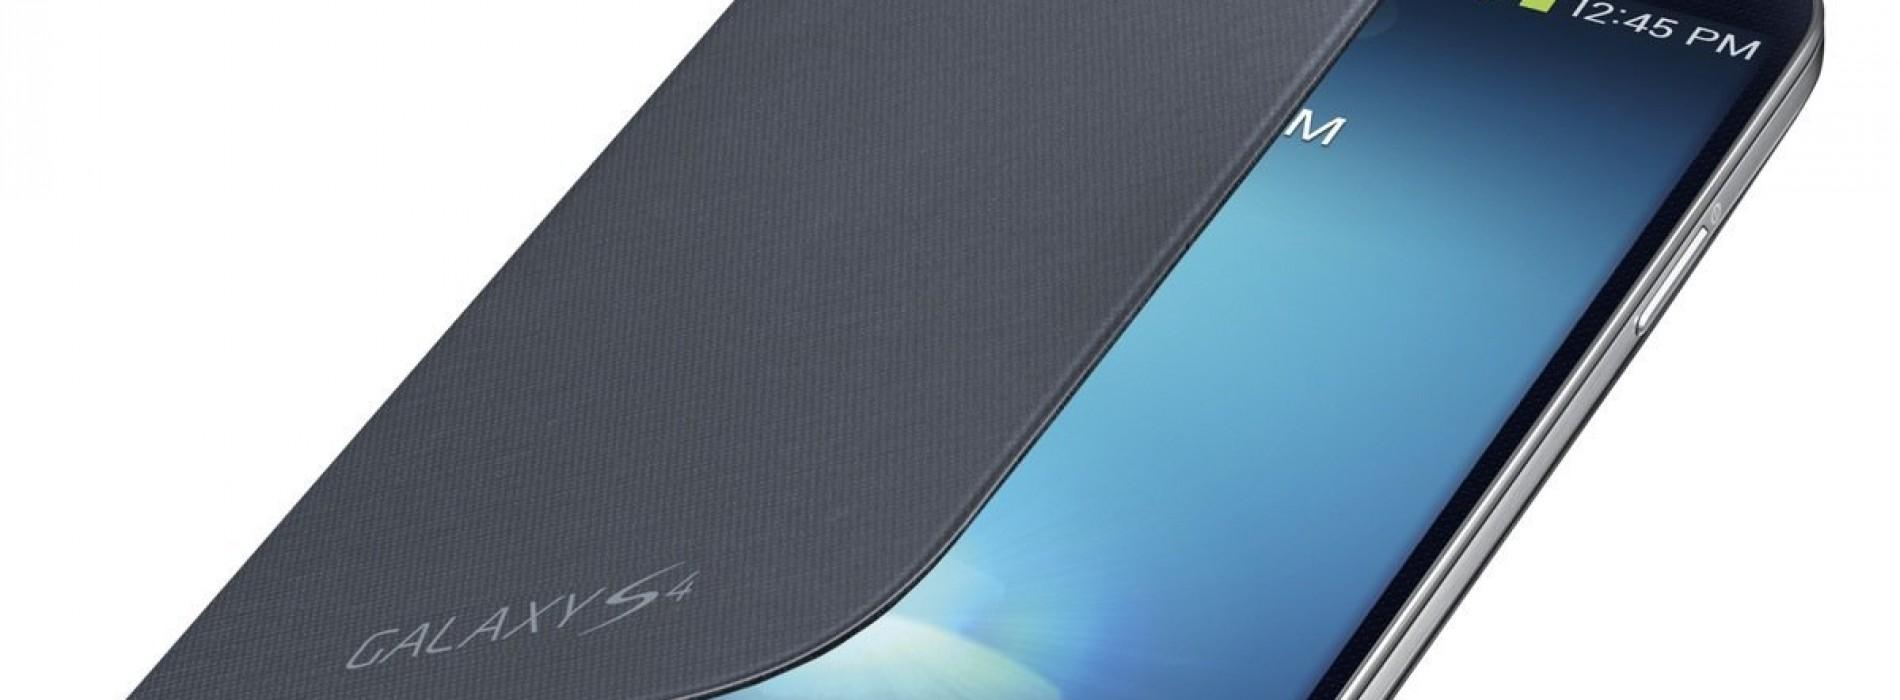 Samsung S-View Flip Cover Folio Case (83% OFF)